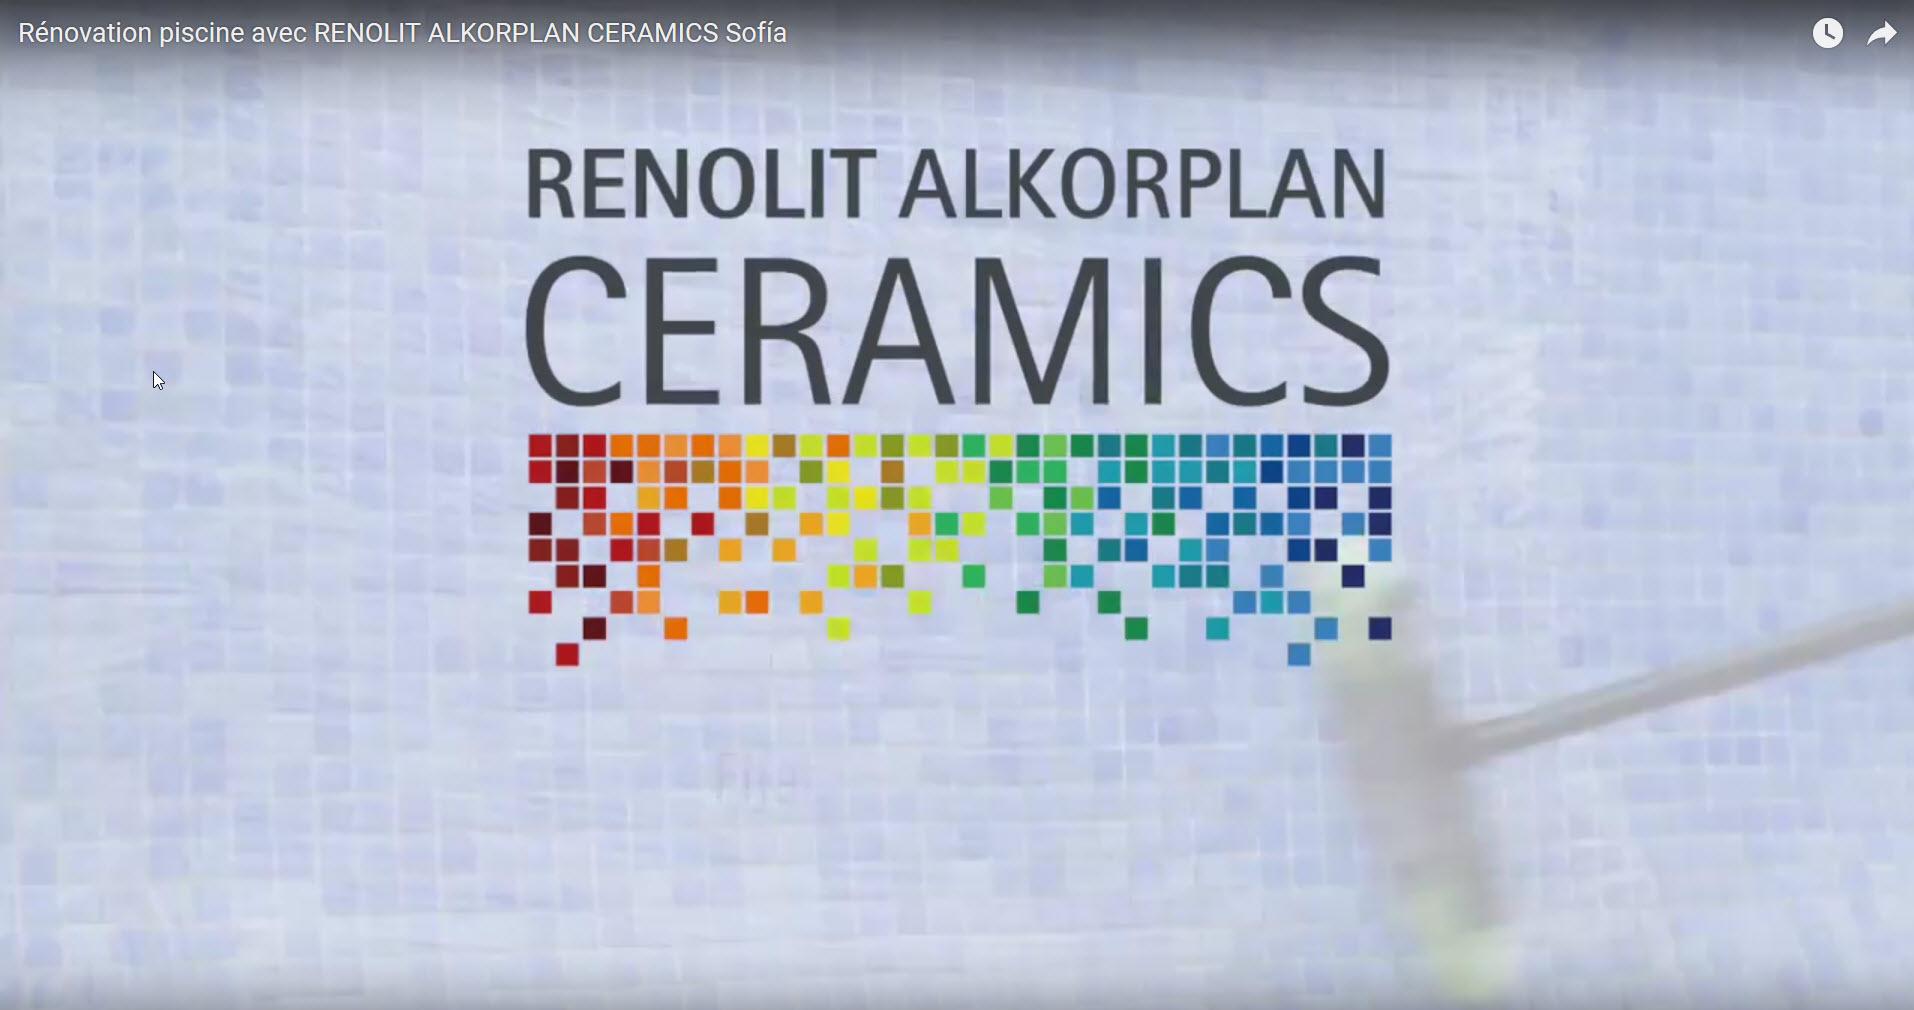 RENOLIT ALKORPLAN CERAMICS